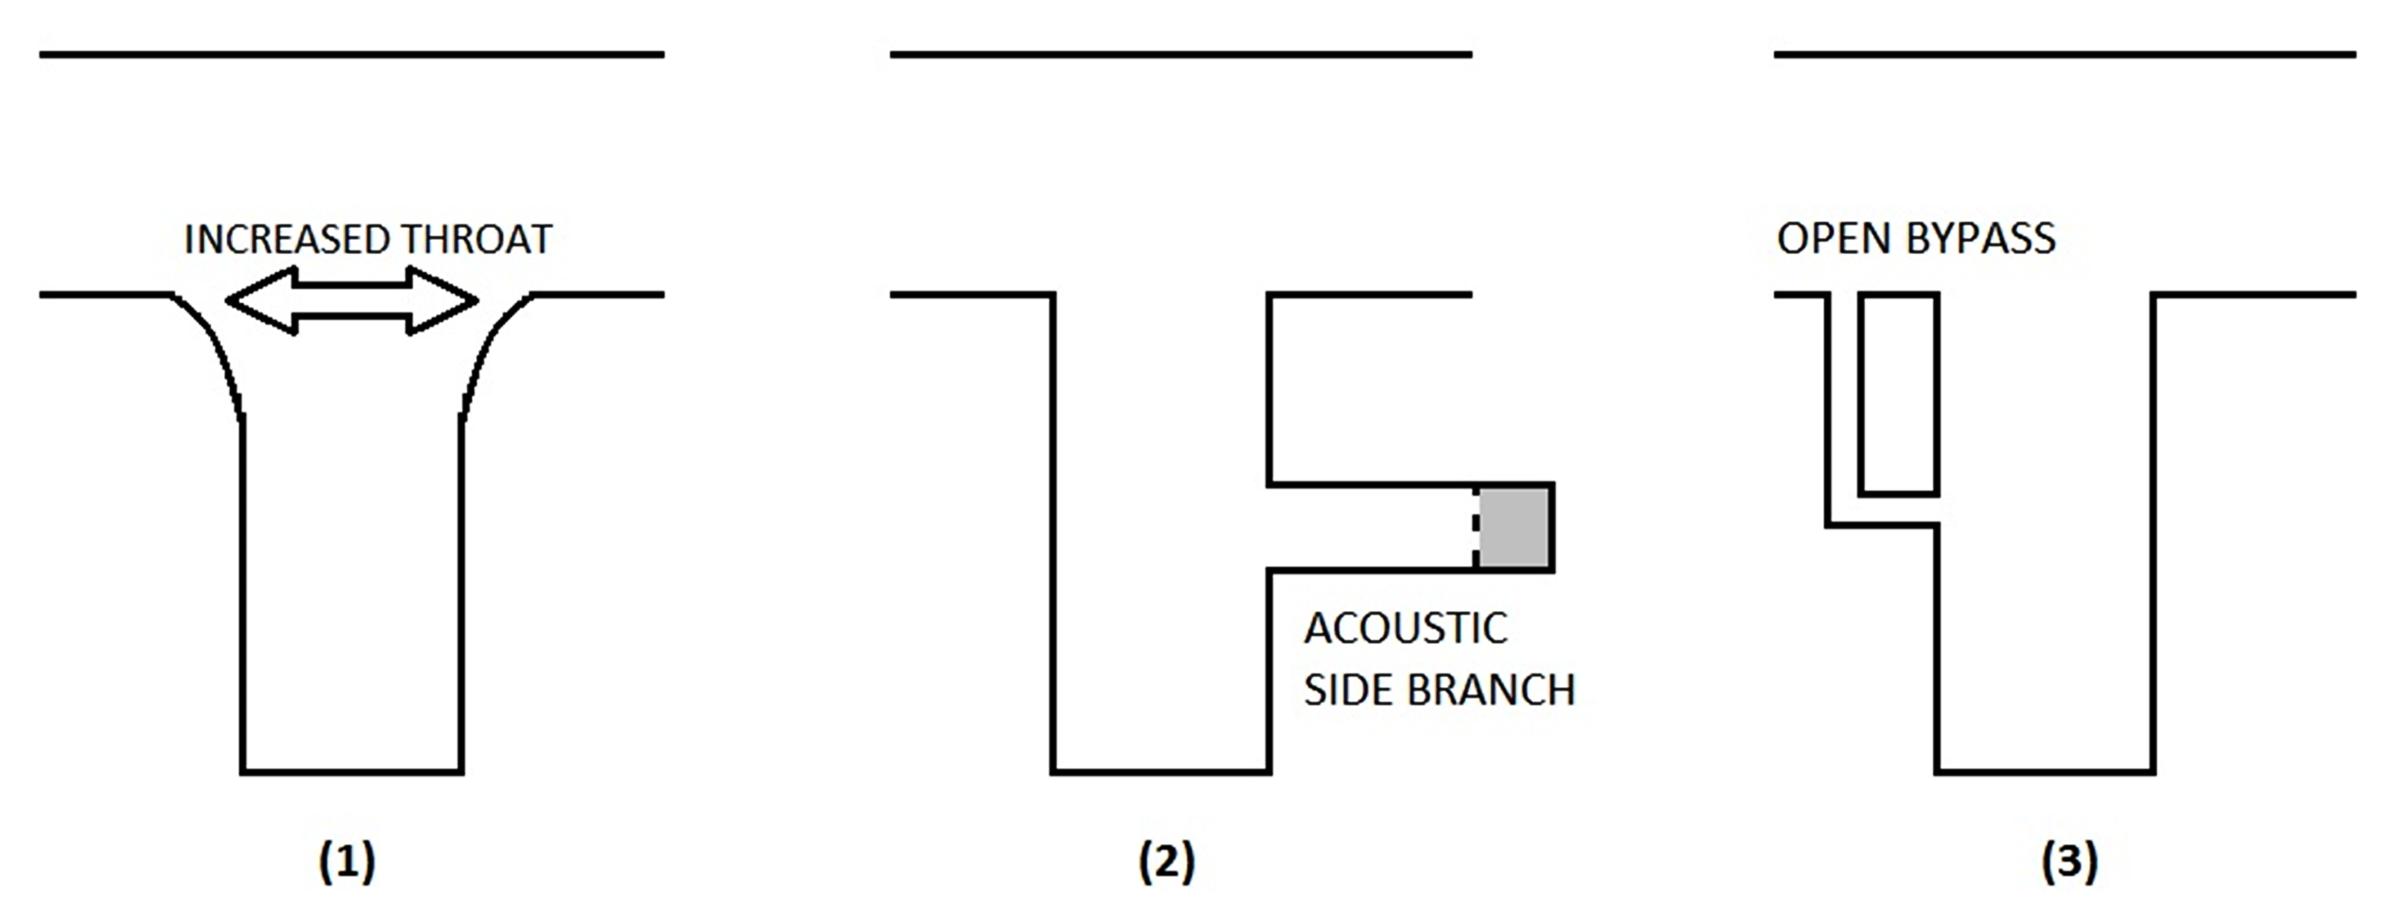 Pipeline Modifications sketch